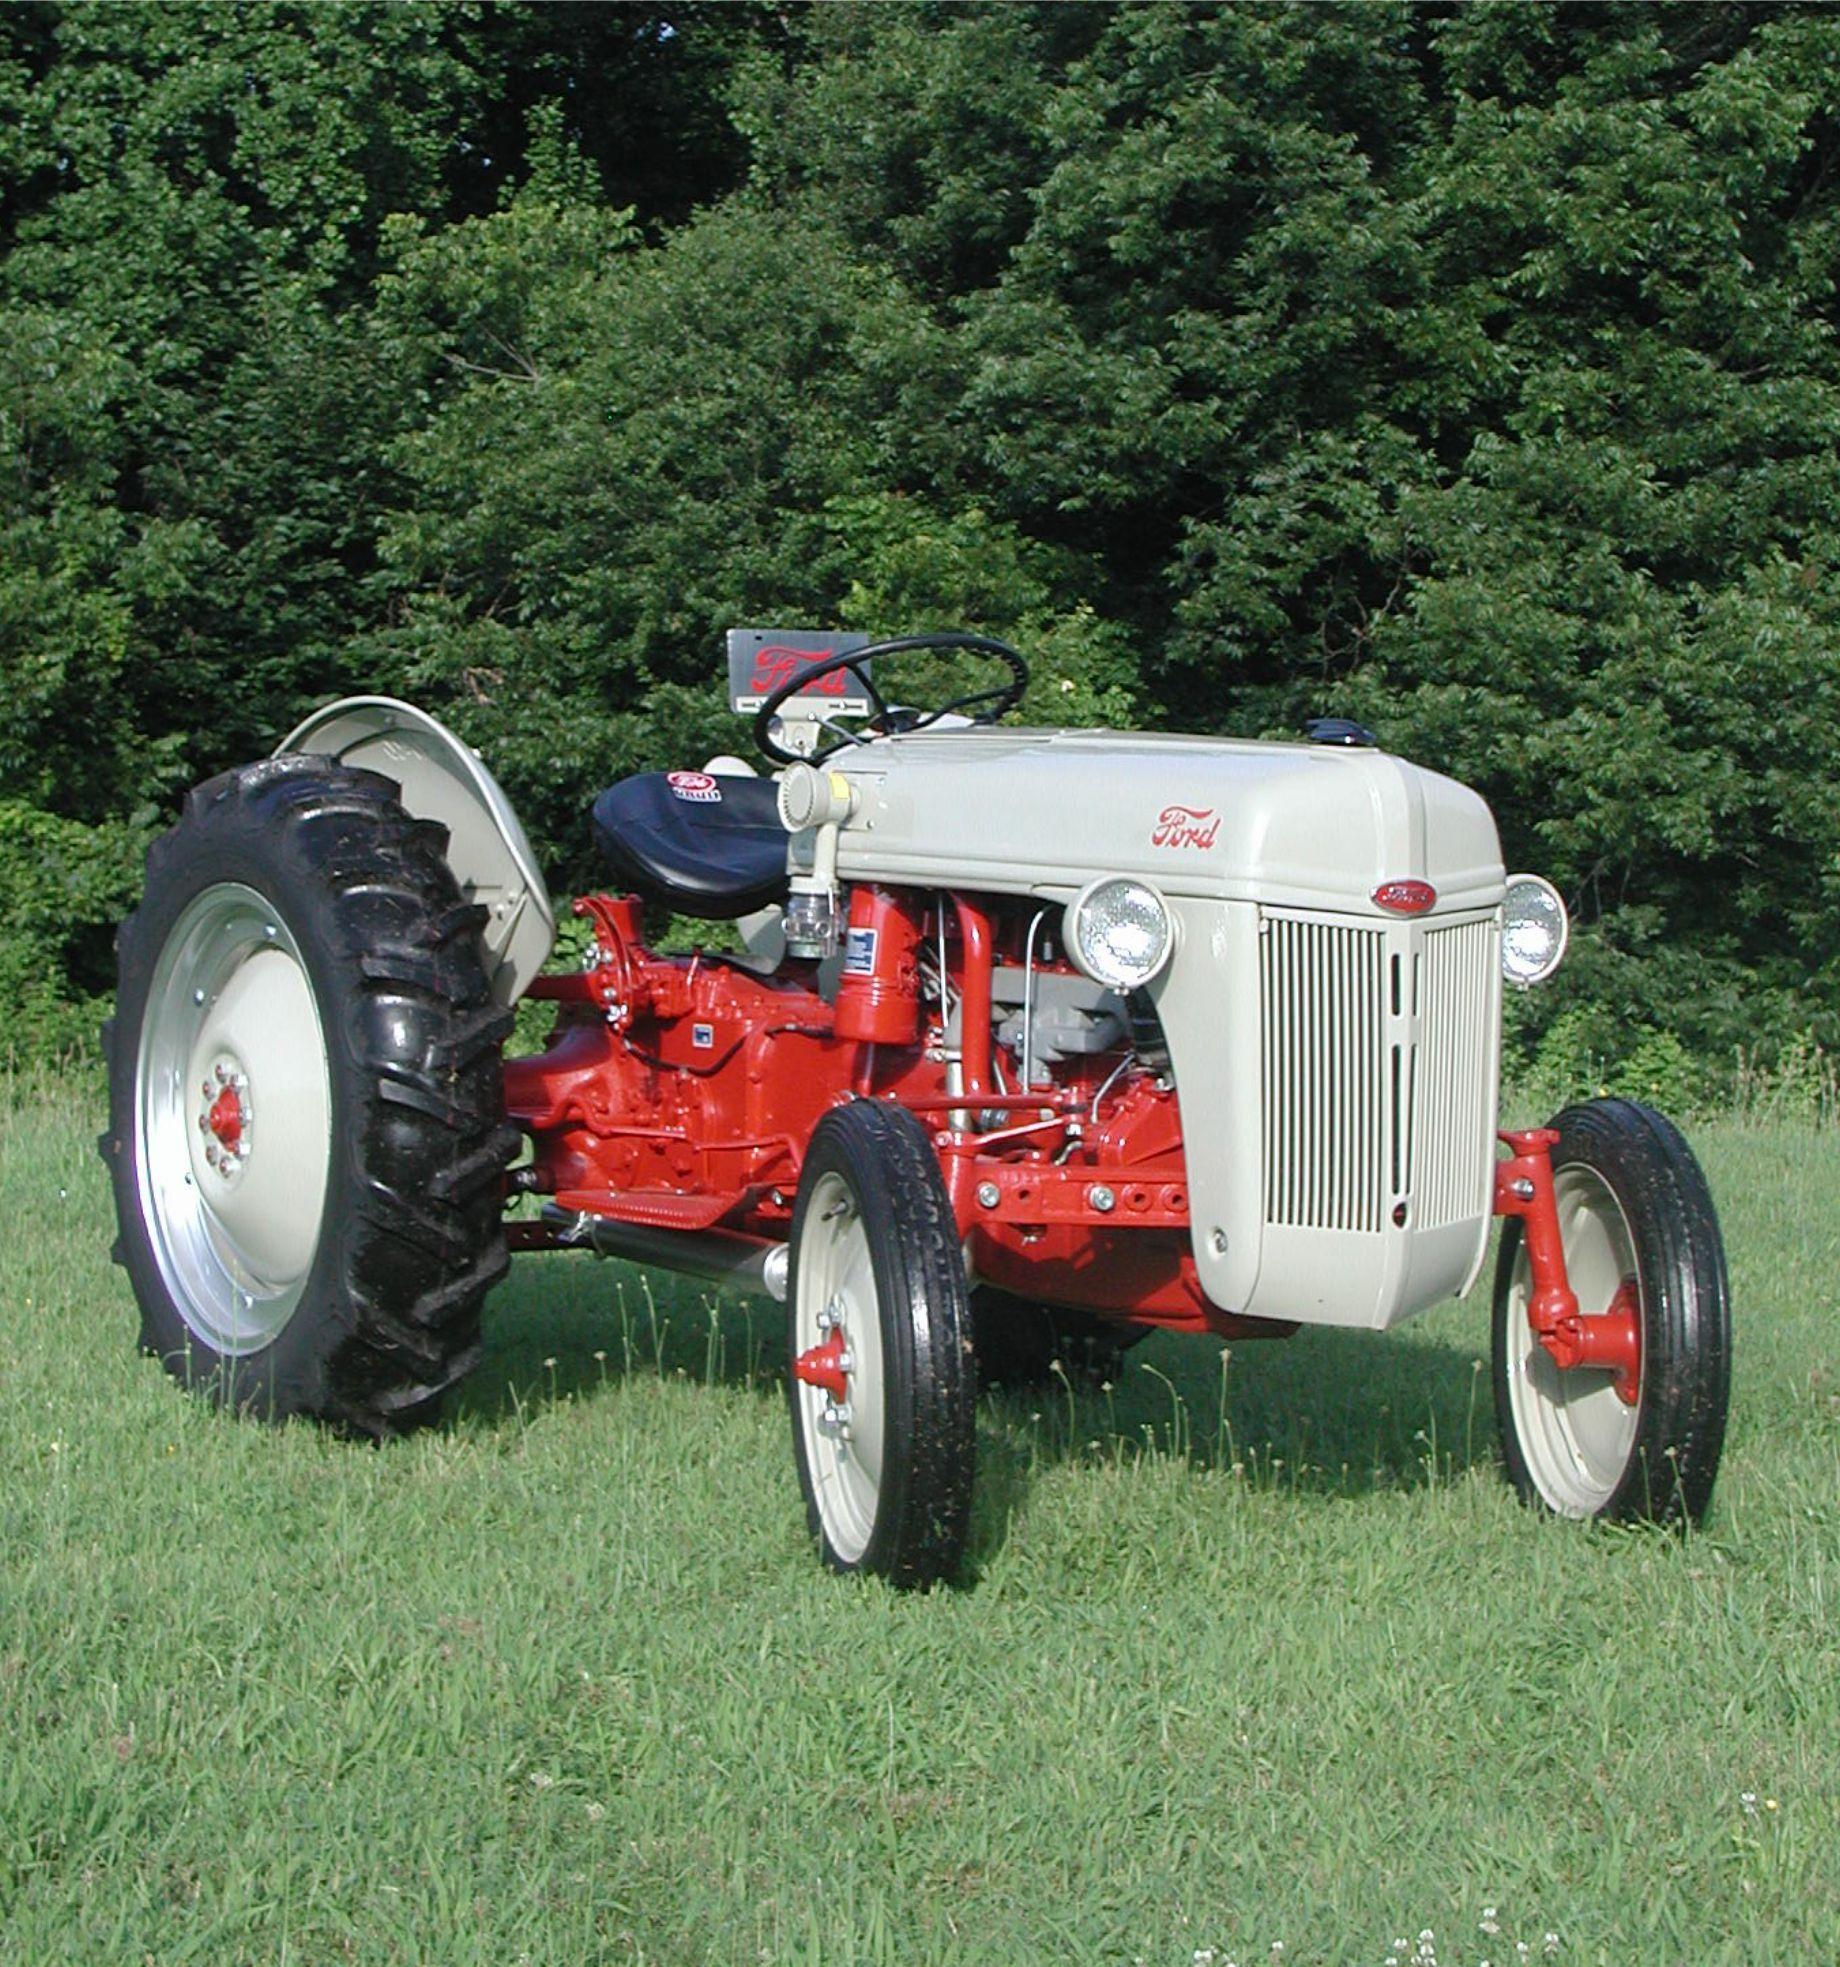 1952 8N Ford Tractor Ford tractors, 8n ford tractor